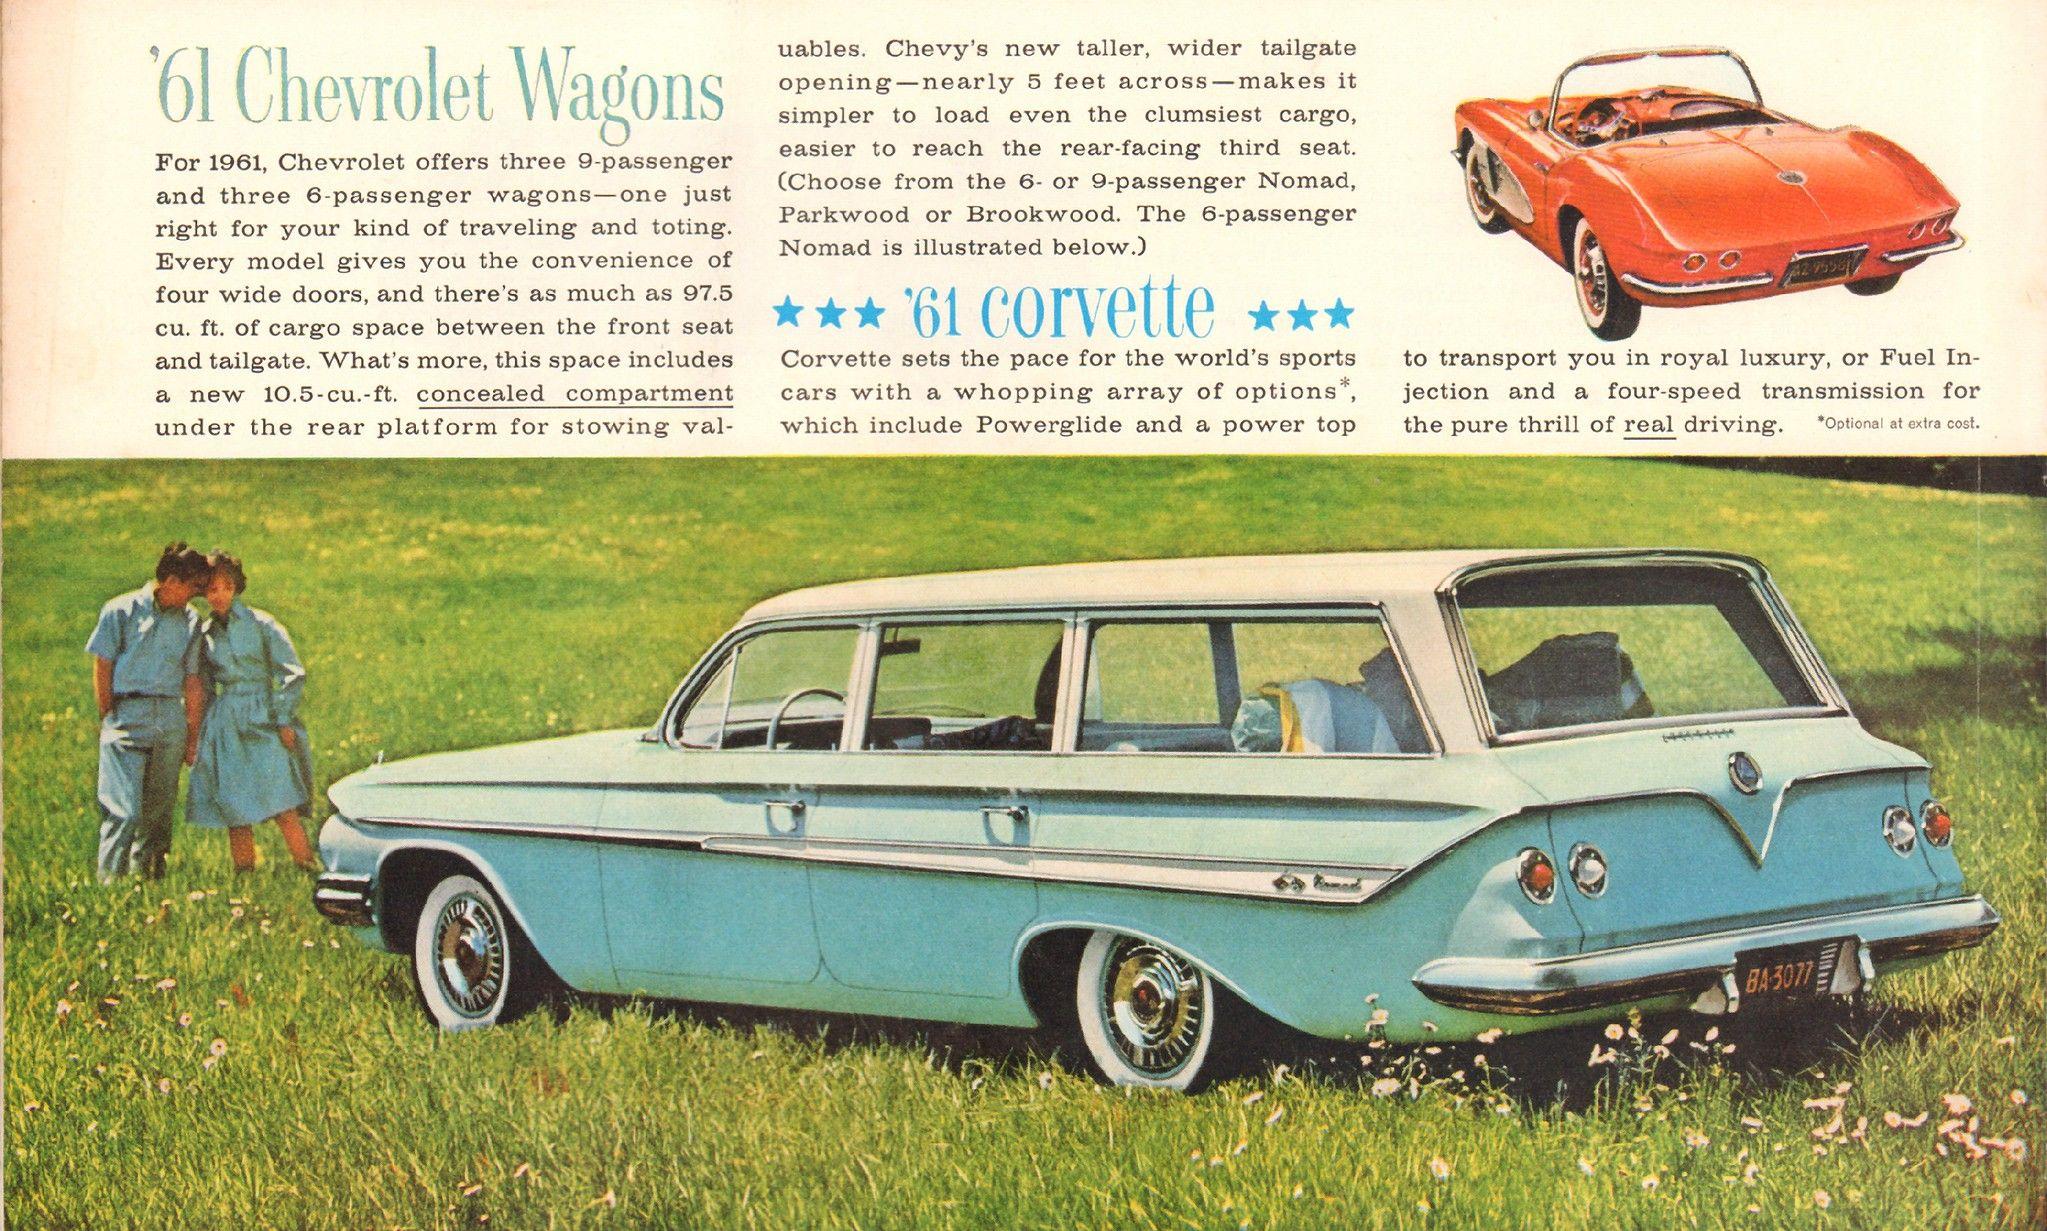 1961 Chevrolet Station Wagon And Corvette Advertisement Life Magazine October 10 1960 Chevrolet Station Wagon Corvette